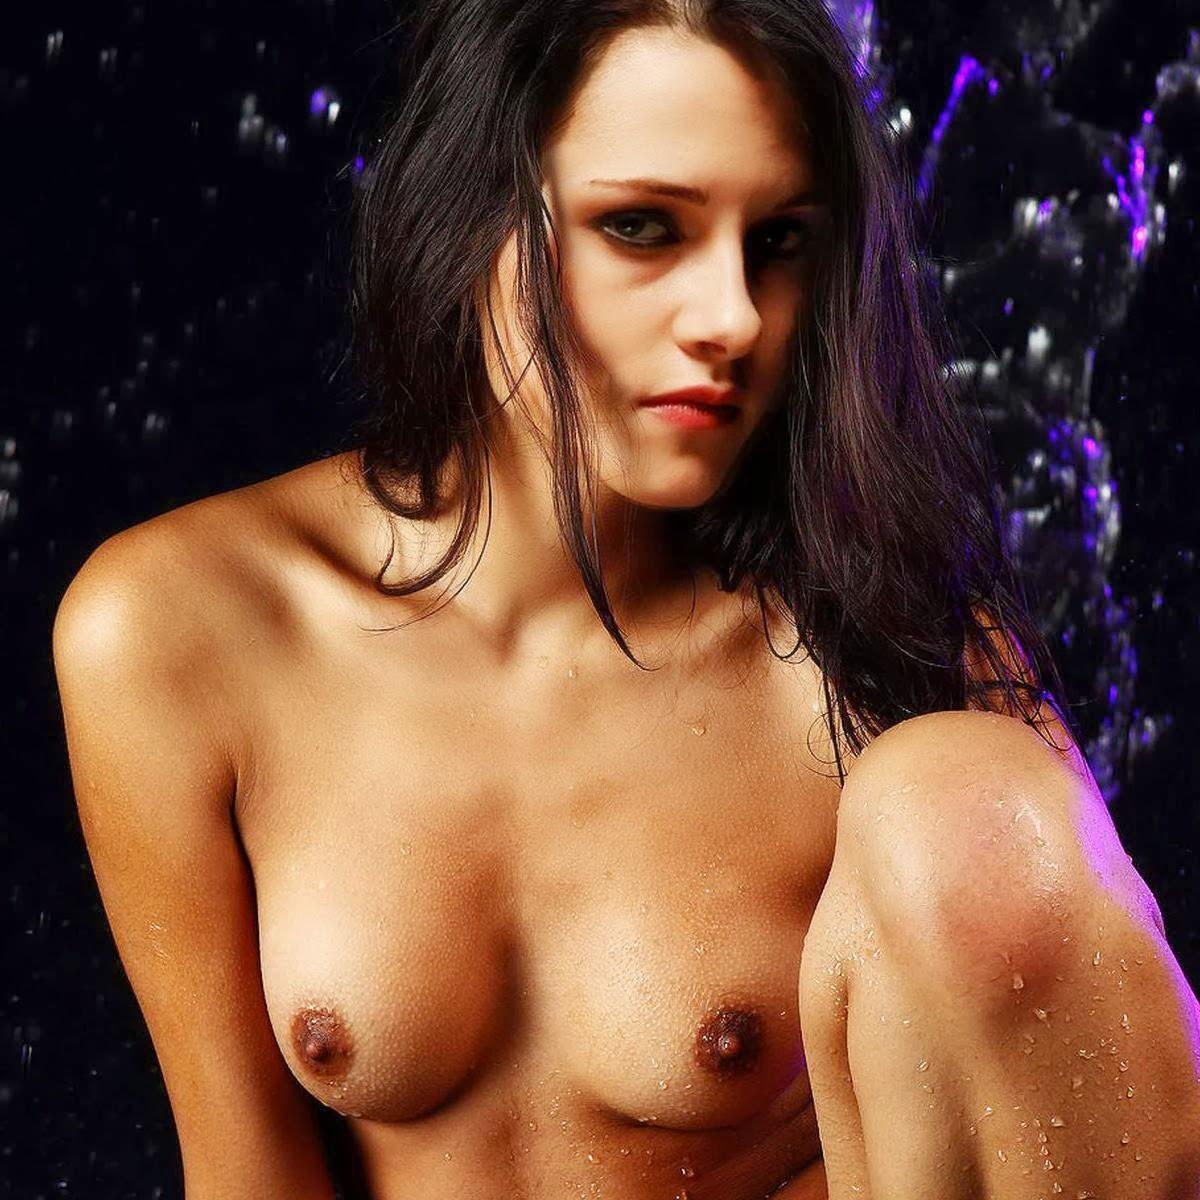 kristen stewart nude spread legs naked photo hot girls